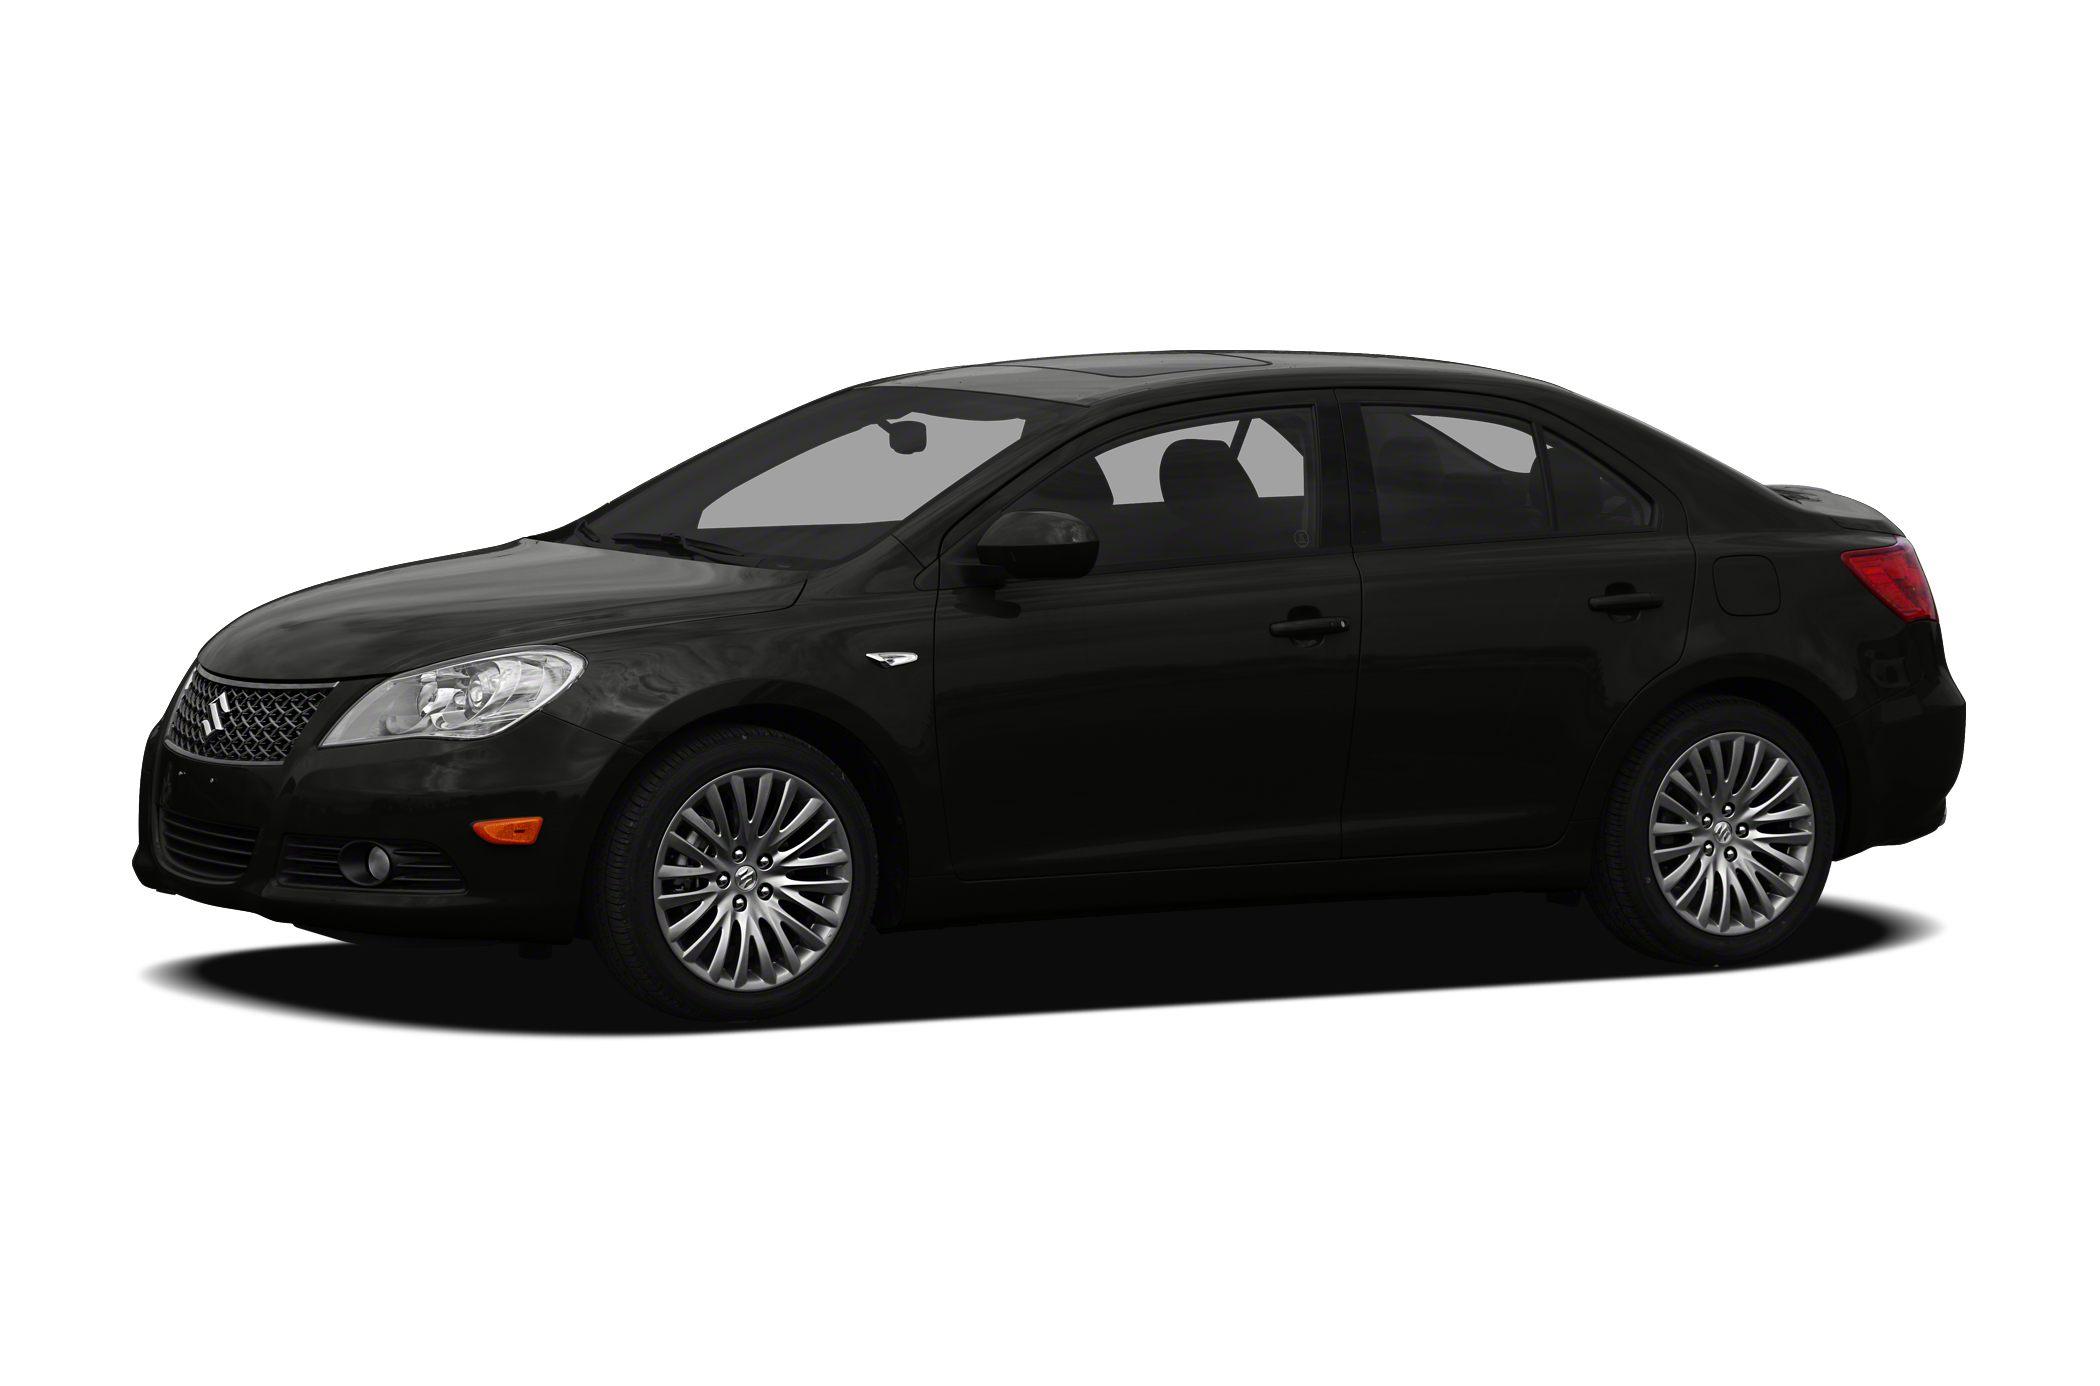 2011 Suzuki Kizashi SE MP3 Player KEYLESS ENTRY 30 MPG Highway ALLOY WHEELS Miles 34369St